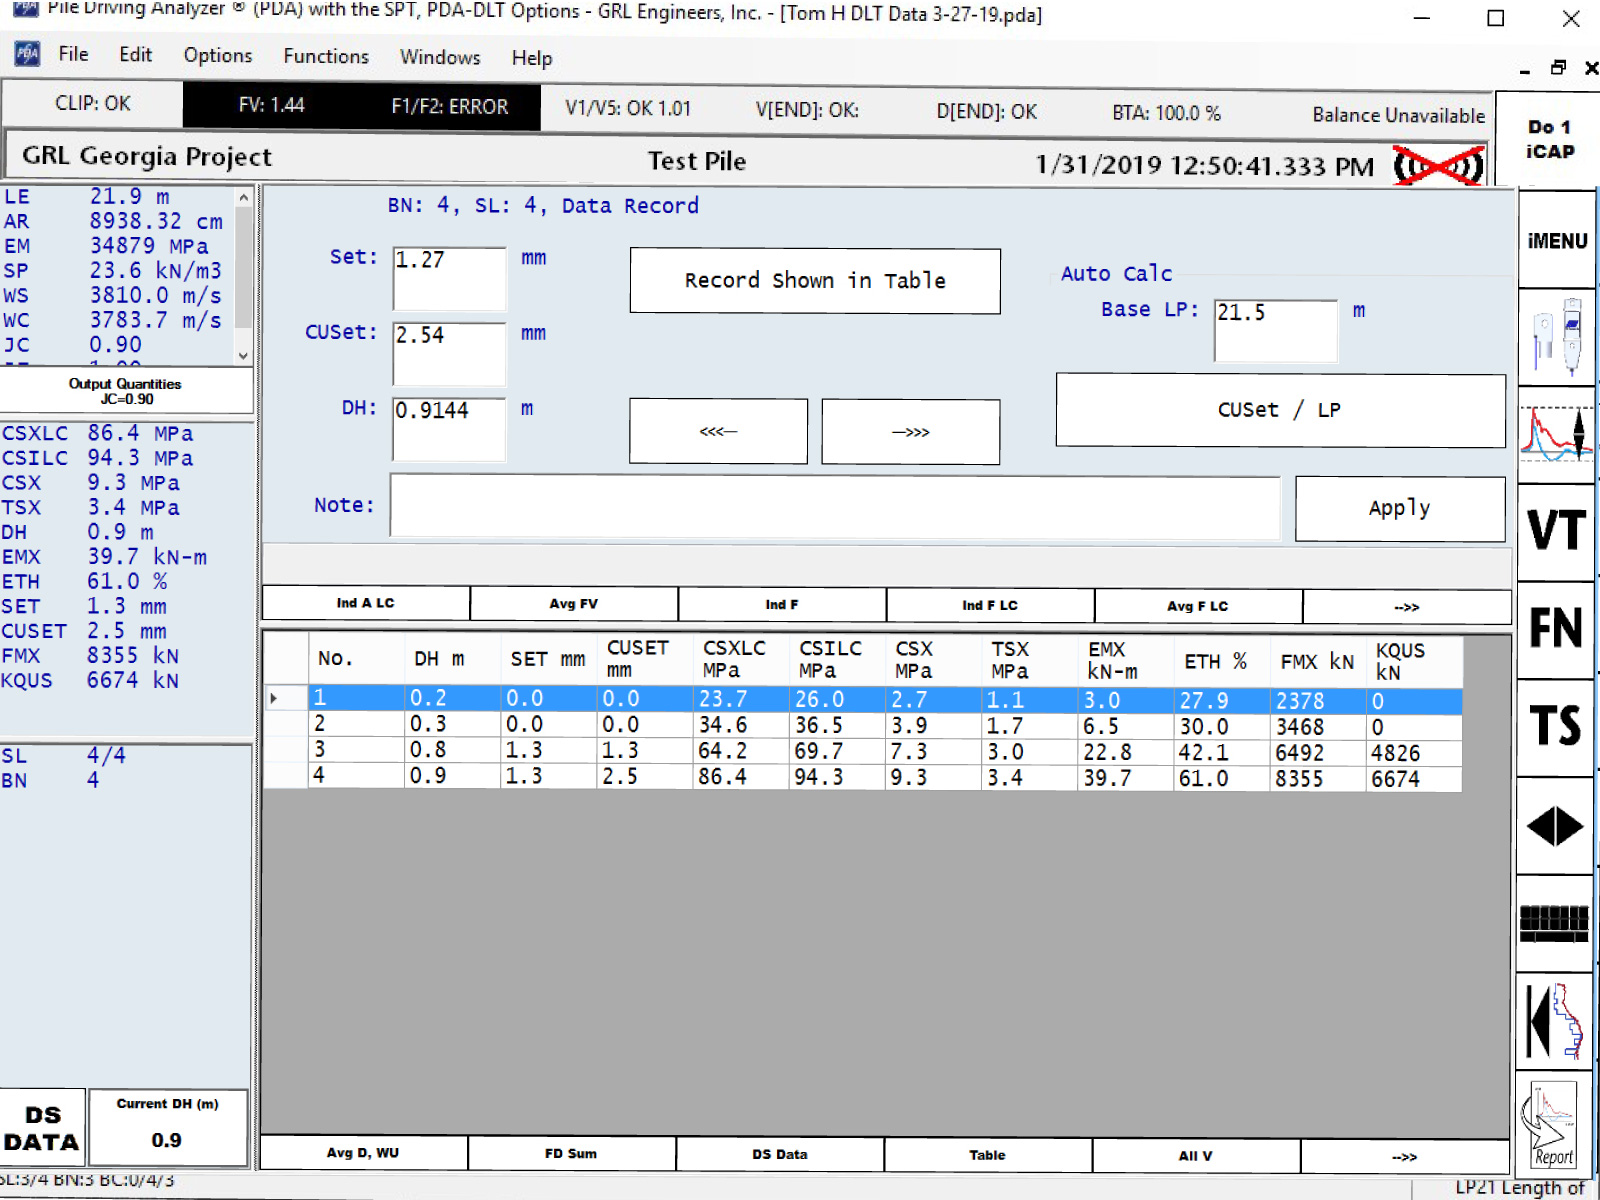 PDA-DLT-ProductImage-06-Web